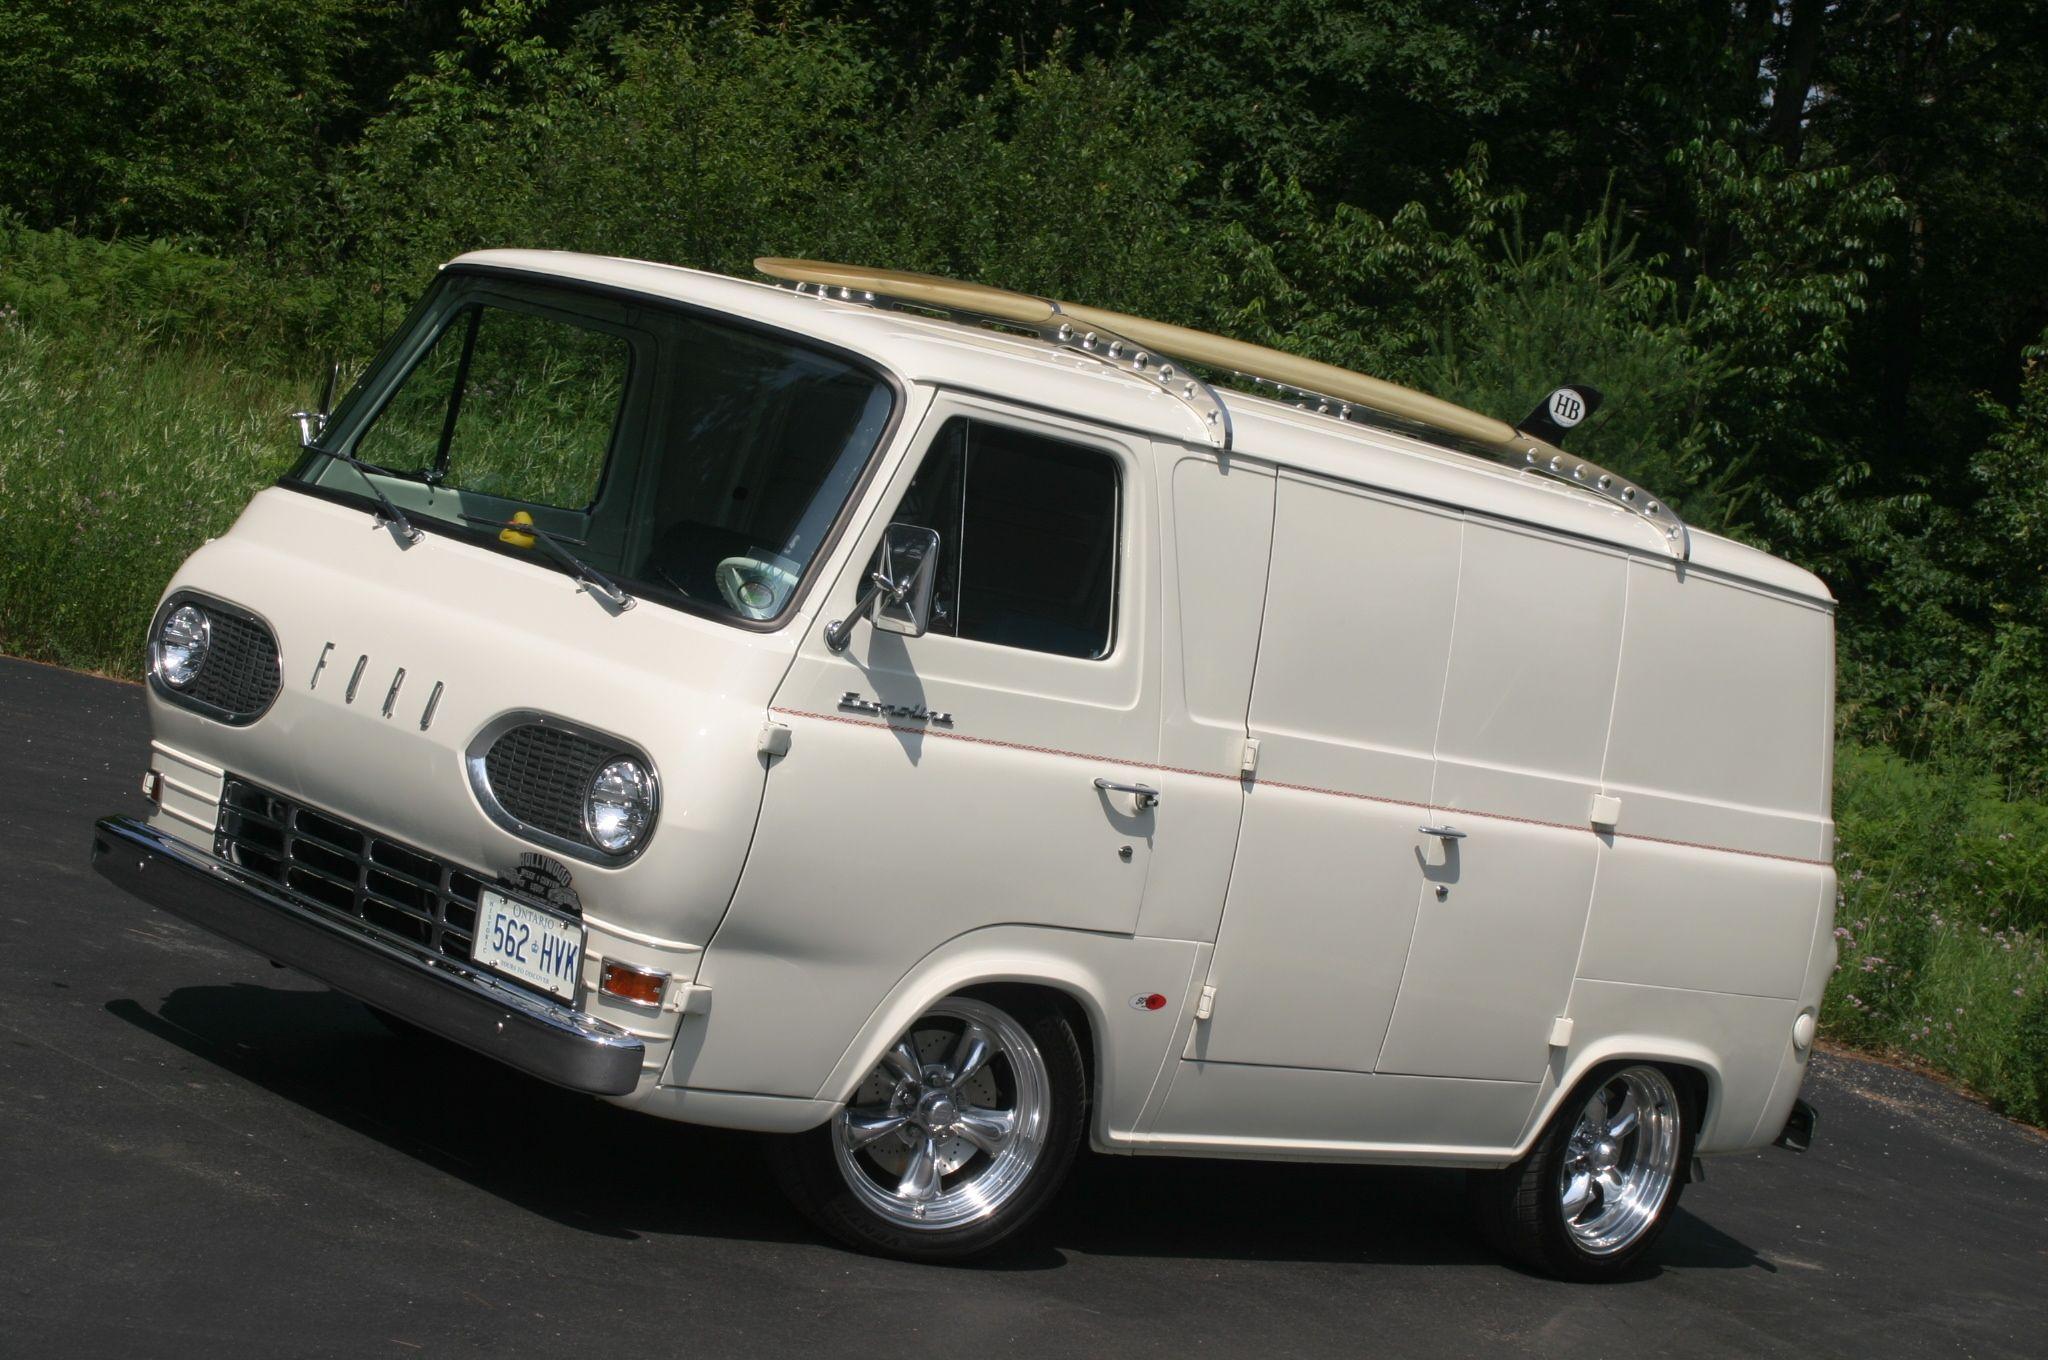 A classic 8 door first gen gem For vintage van merch check out